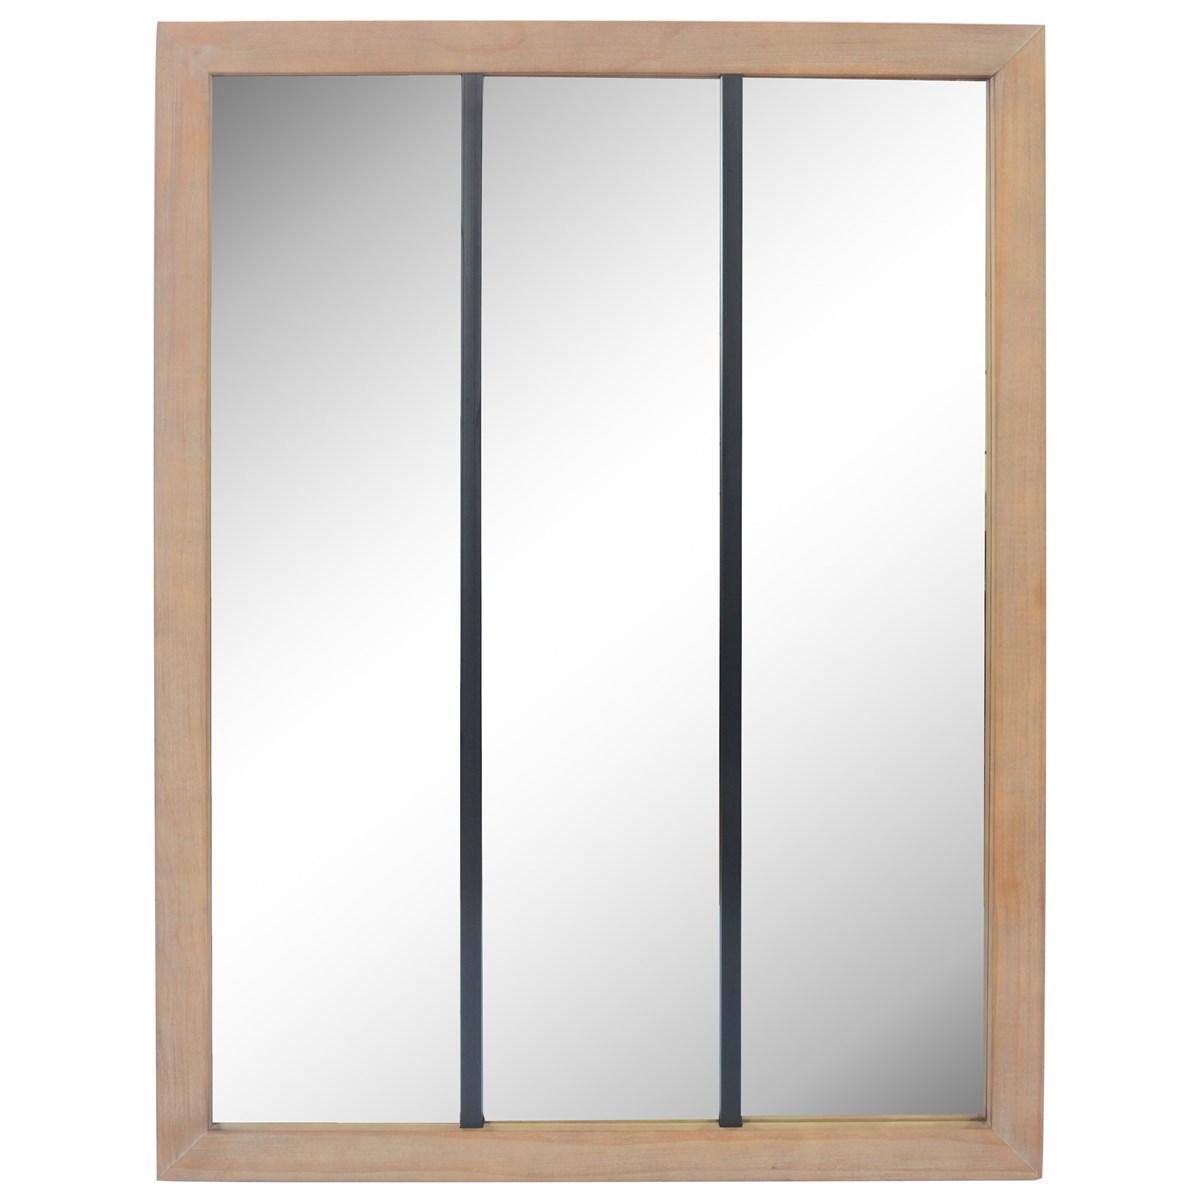 Miroir 3 bandes en bois marron et métal 85x113